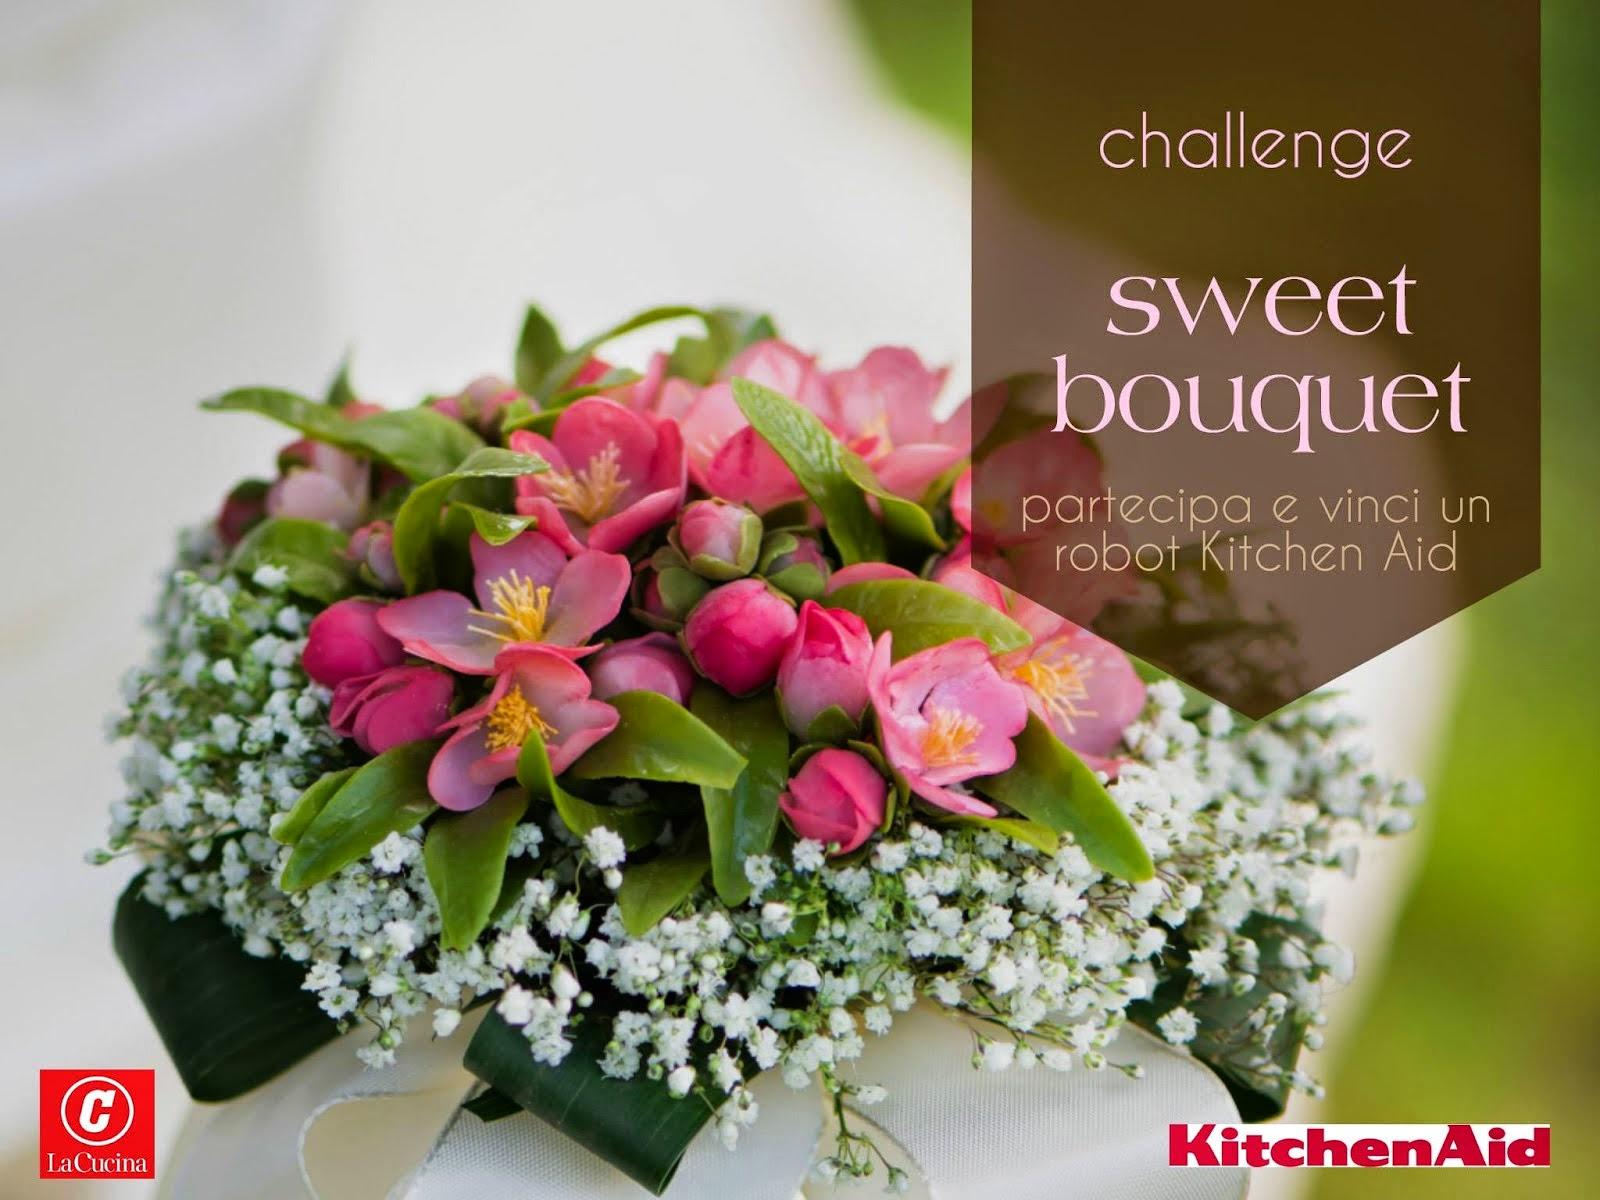 Partecipo alla challenge sweet bouquet: